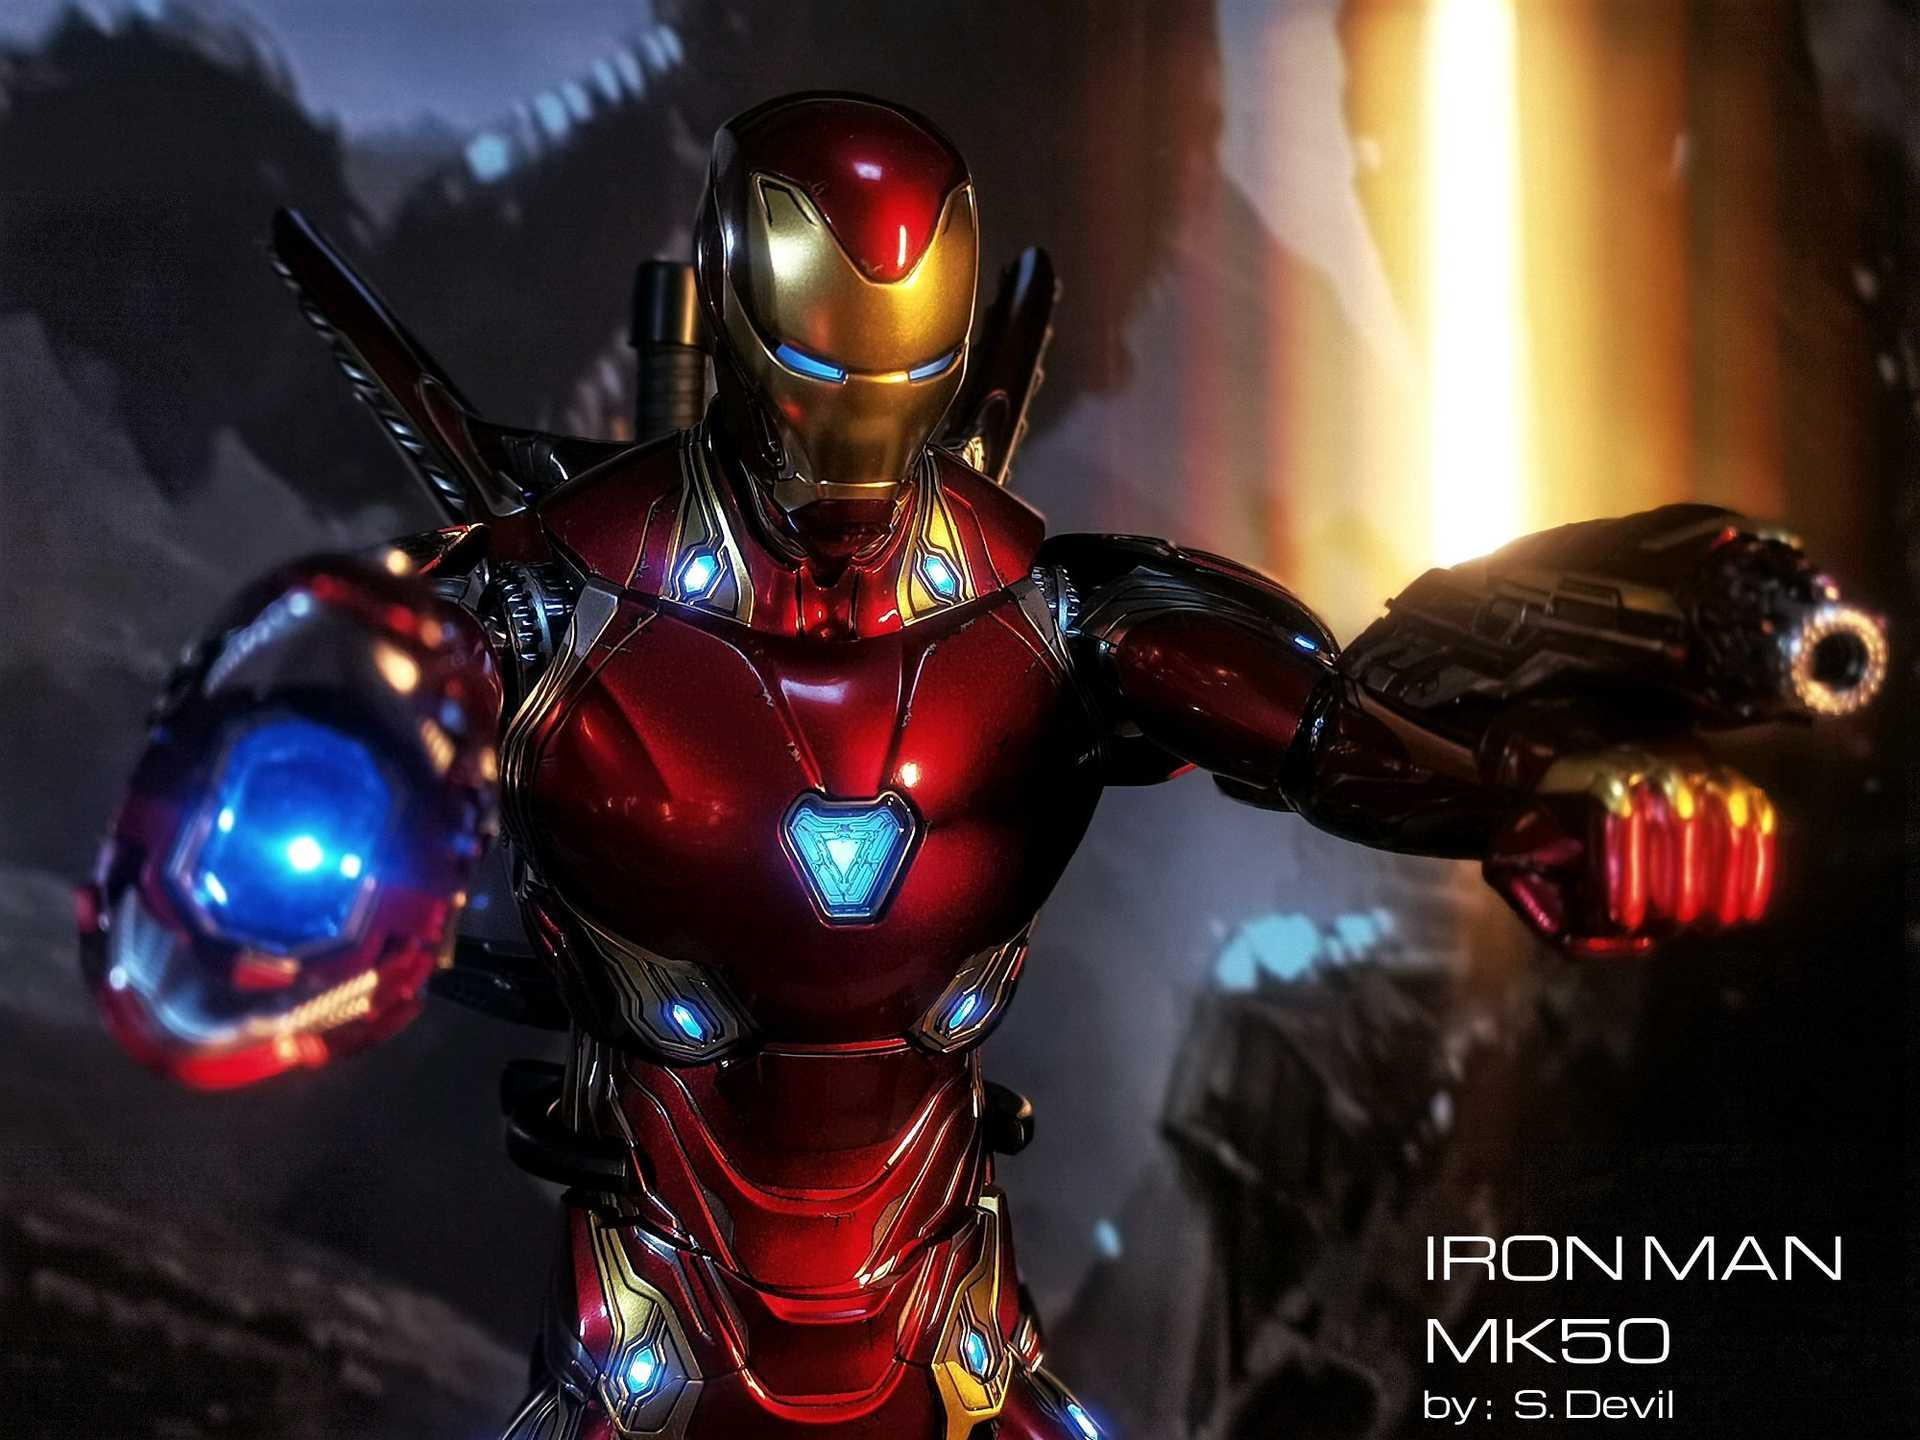 Hot Toys Iron Man Mark 50 Gallery Figround